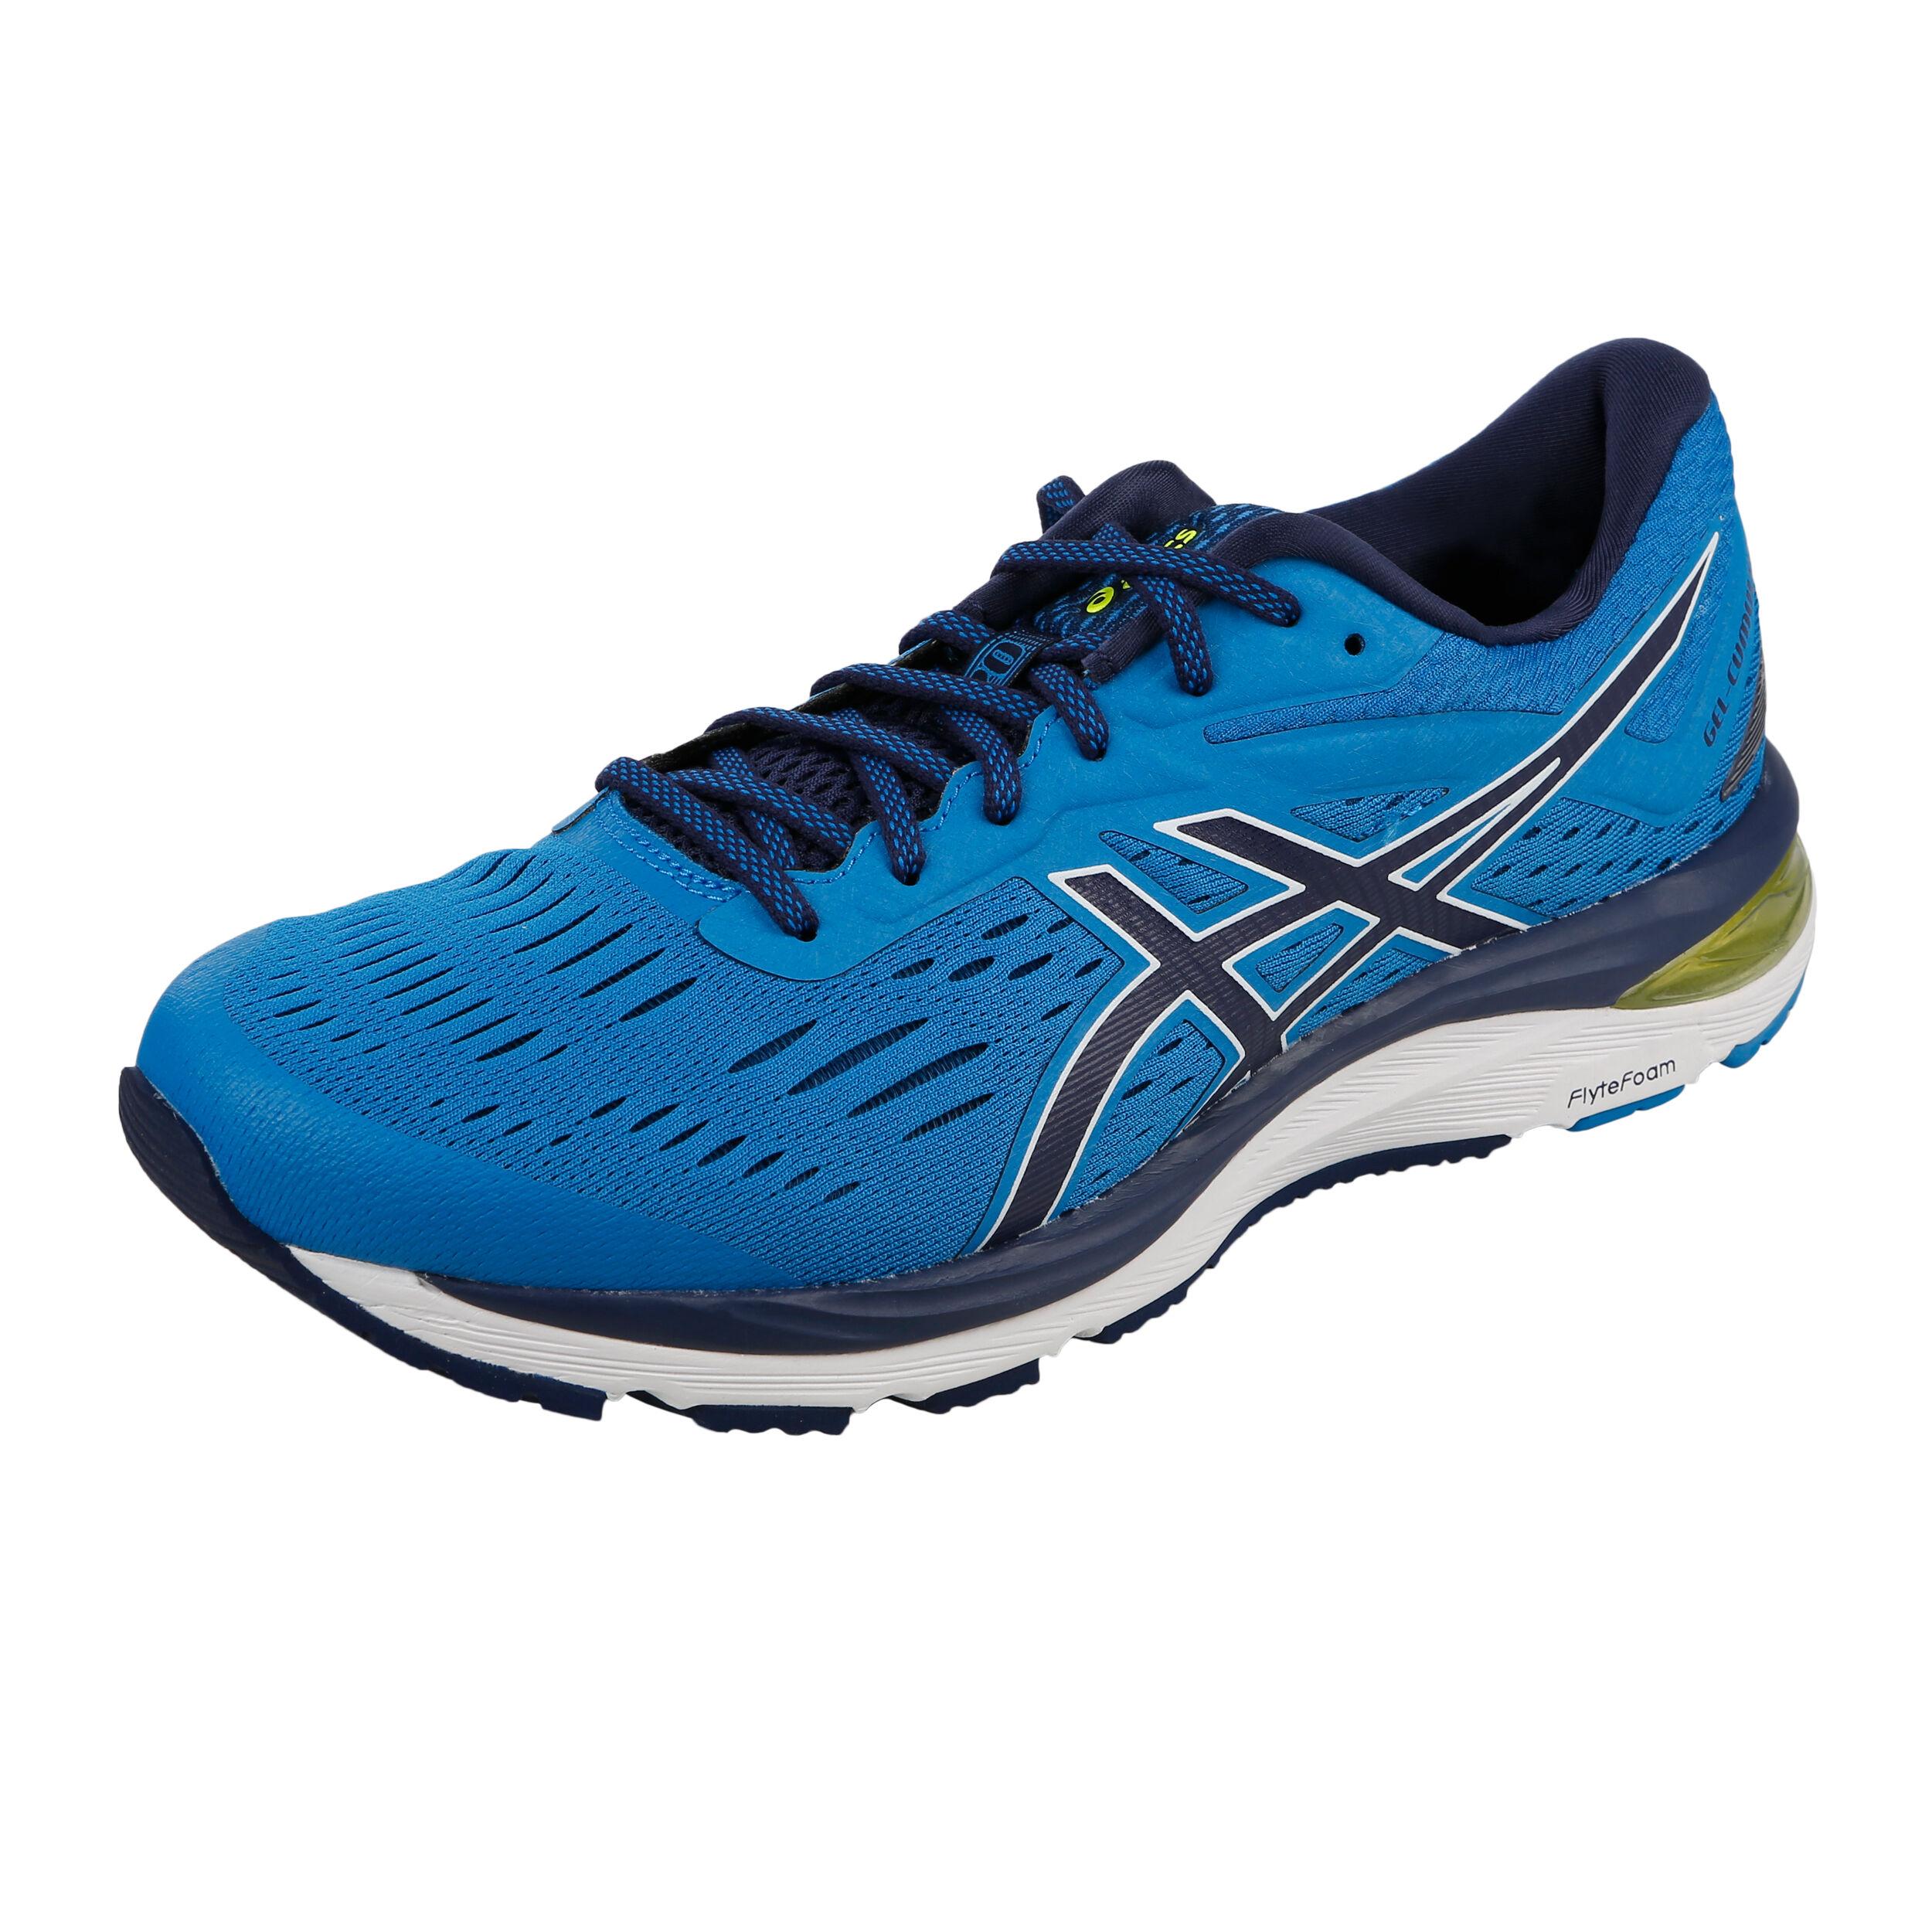 Running Cumulus Gel Asics Buy 20 Blue Dark Blue Neutral Men Shoe wx4aFxqC6